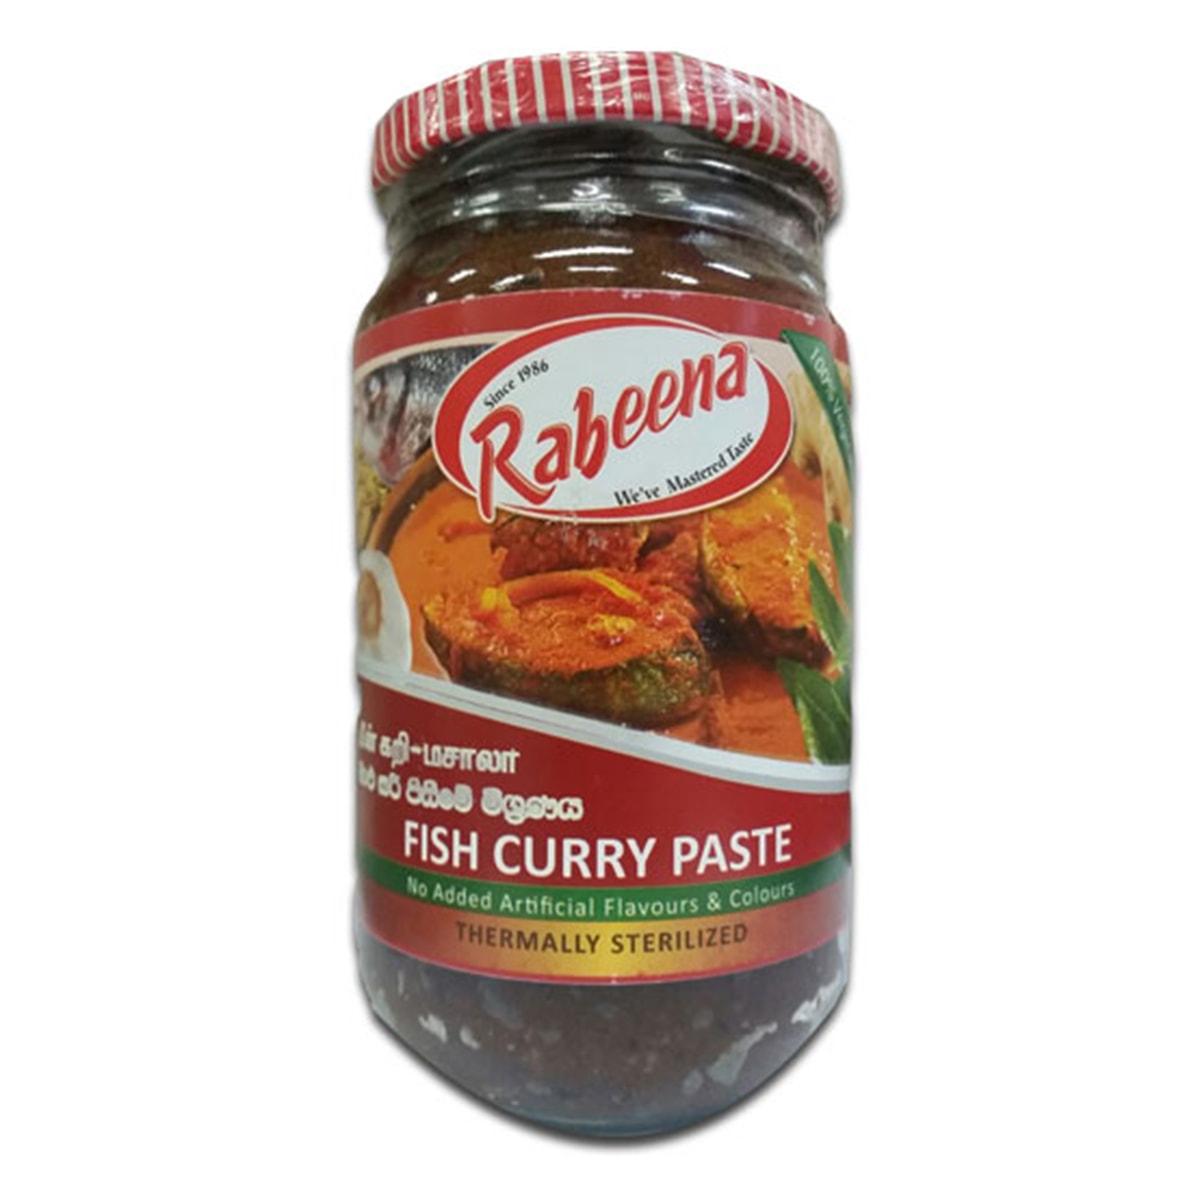 Buy Rabeena Fish Curry Paste - 380 gm